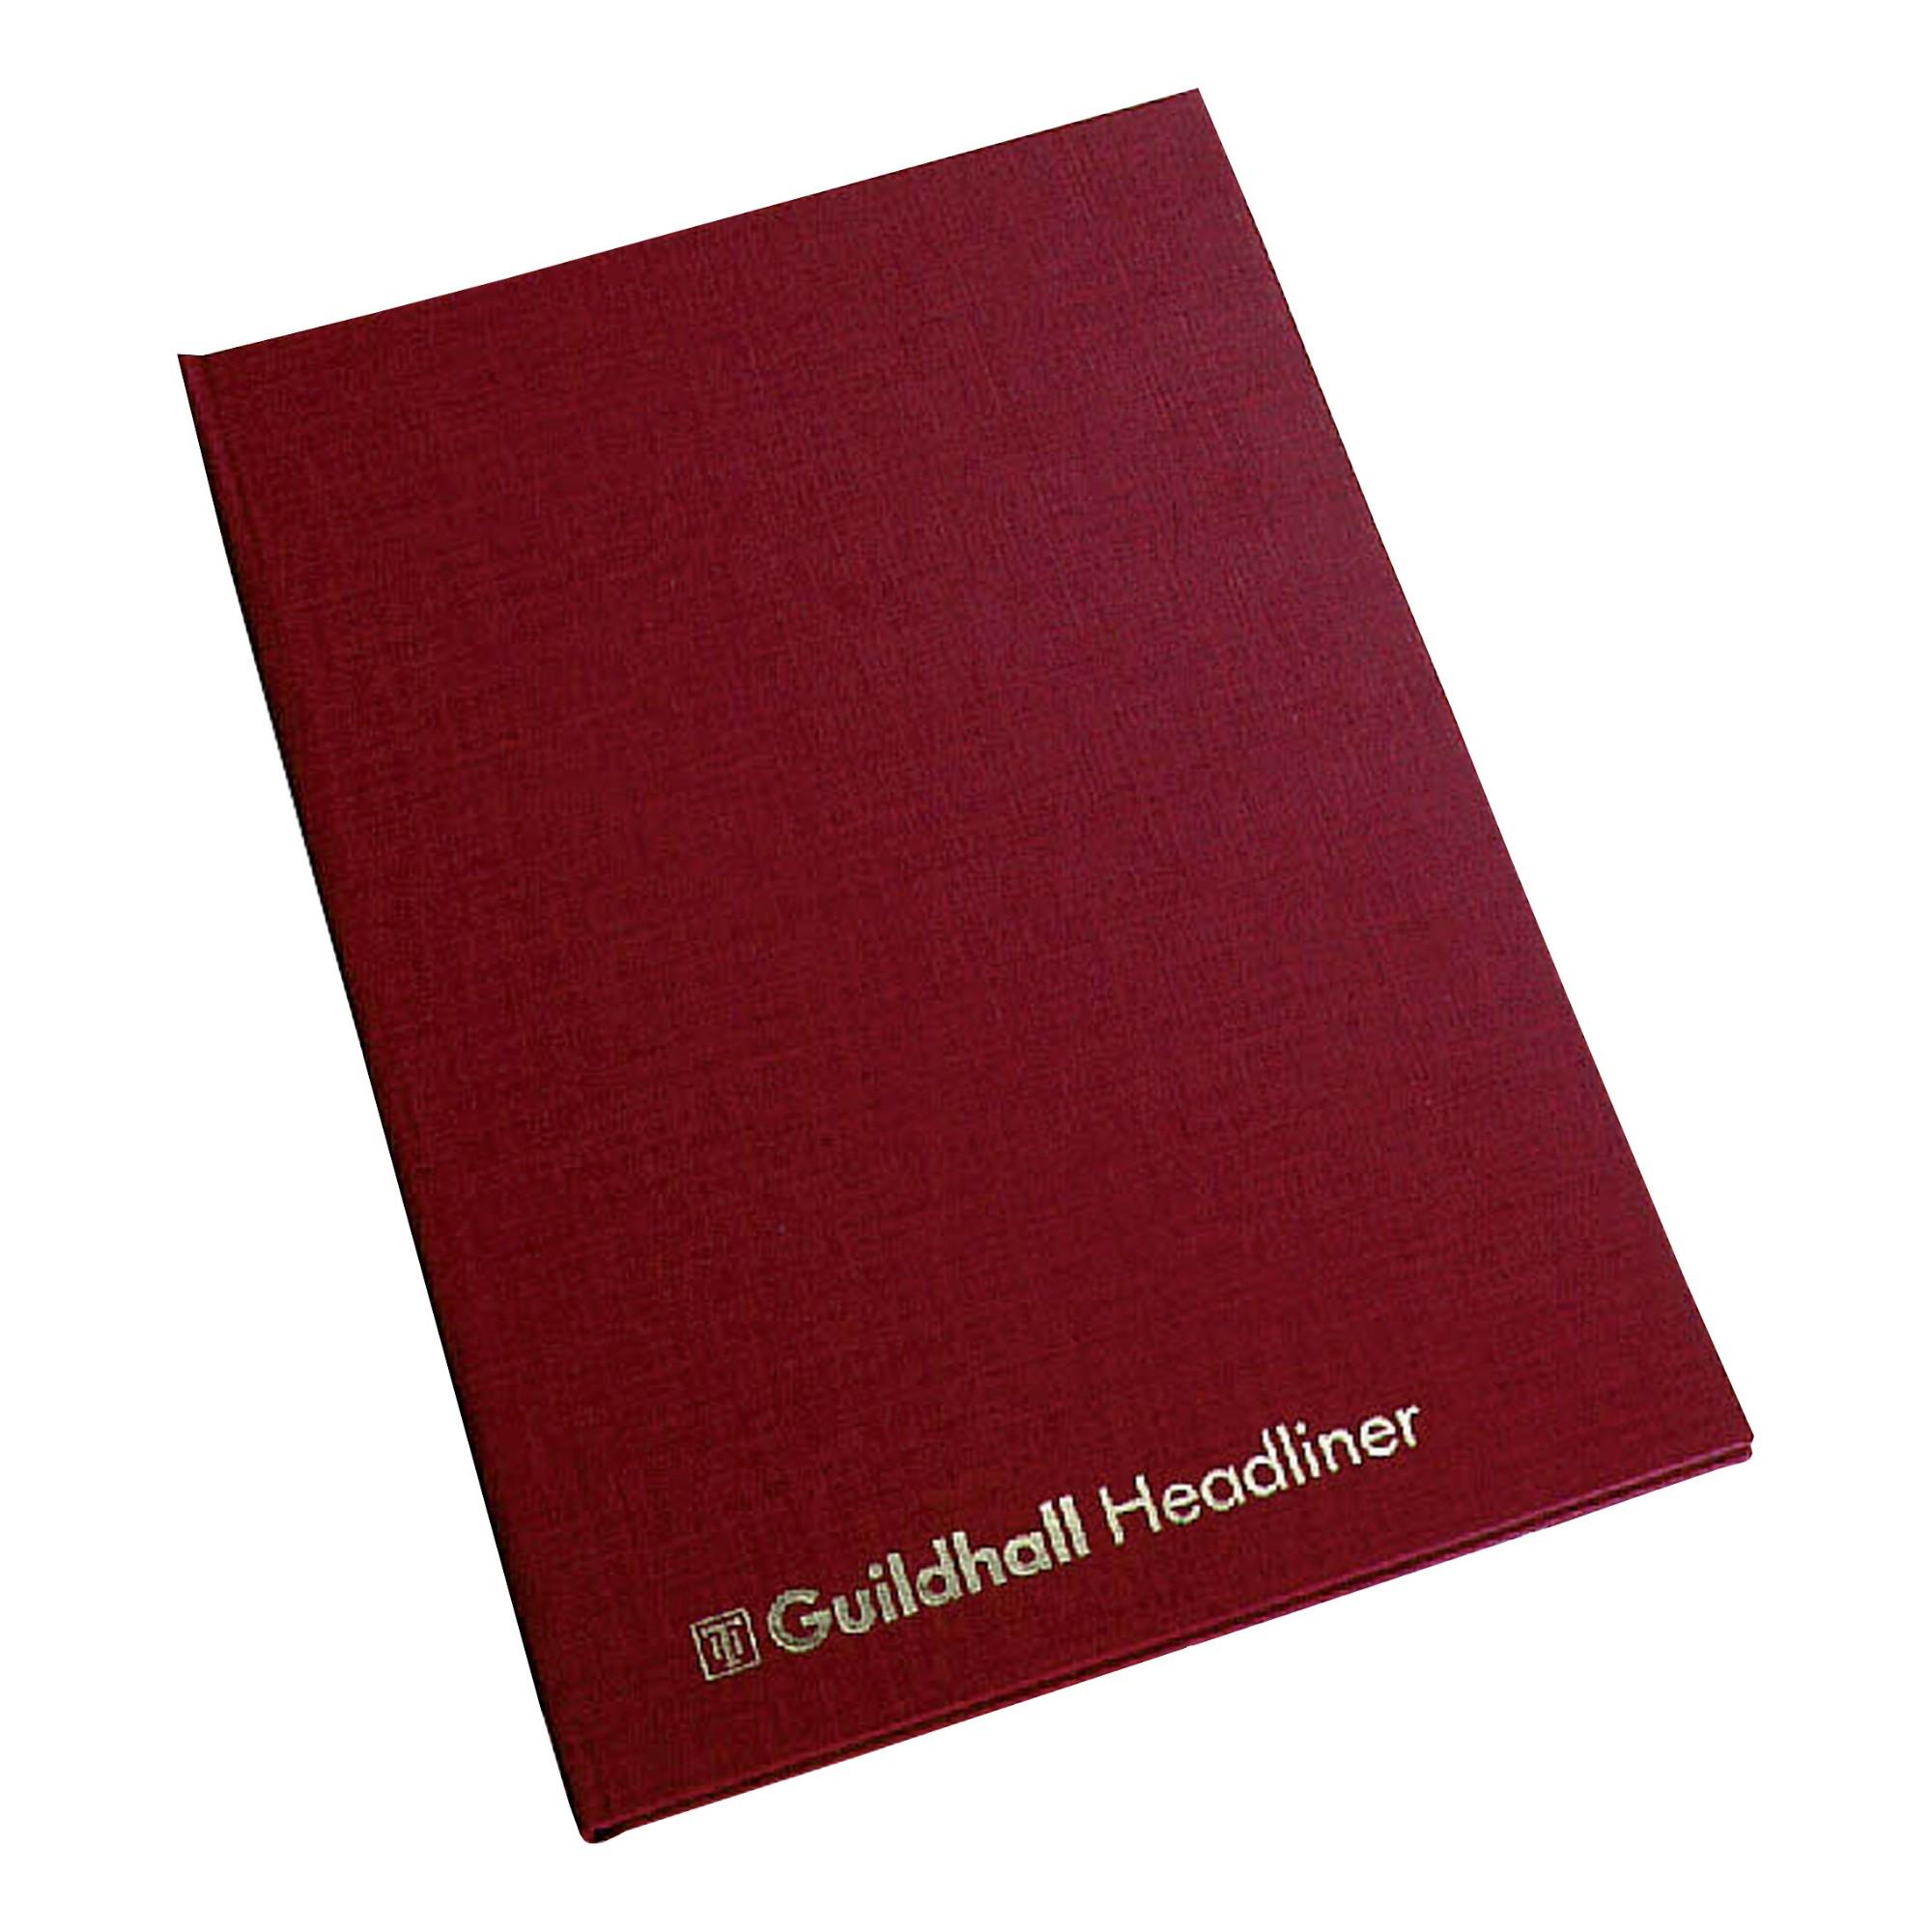 Guildhall 38/10Z Headliner Book 1149